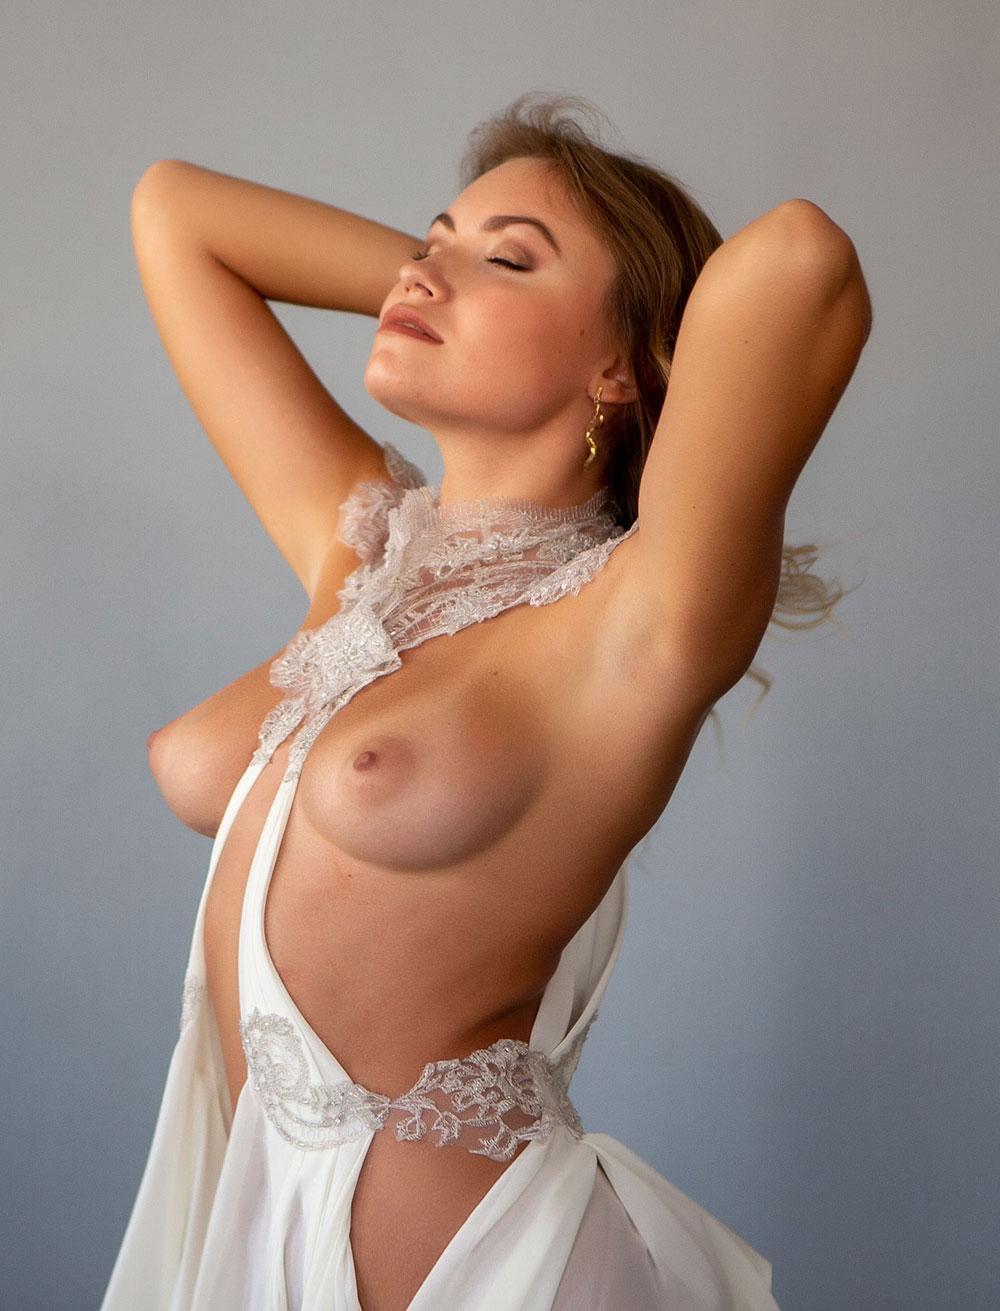 Nicole-ross-model-mk-nude-photo